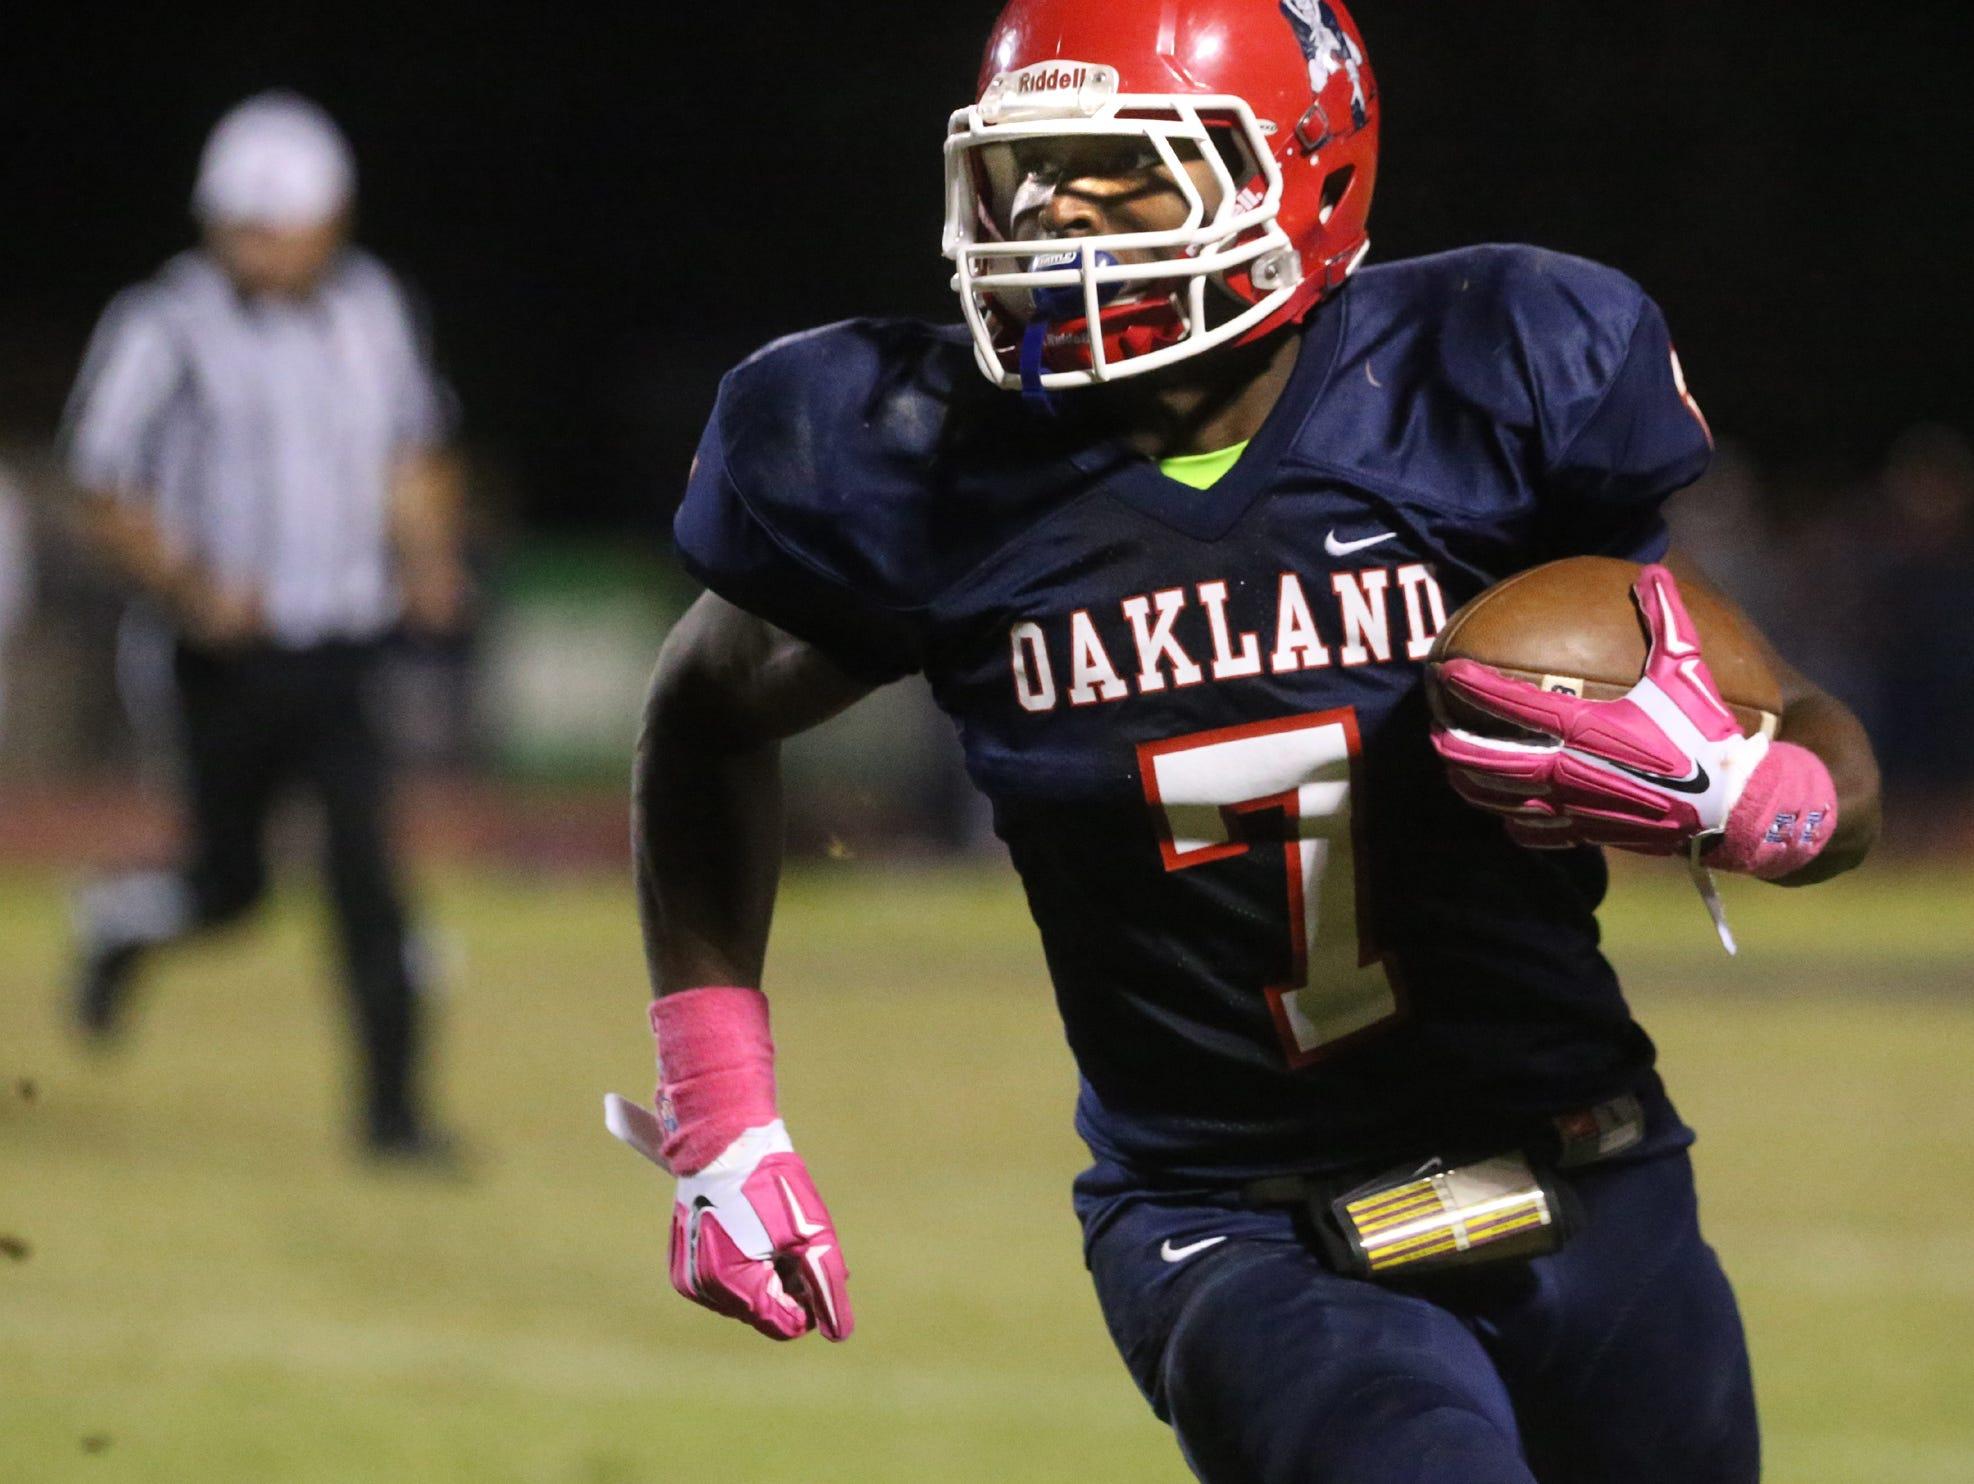 Oakland athlete JaCoby Stevens